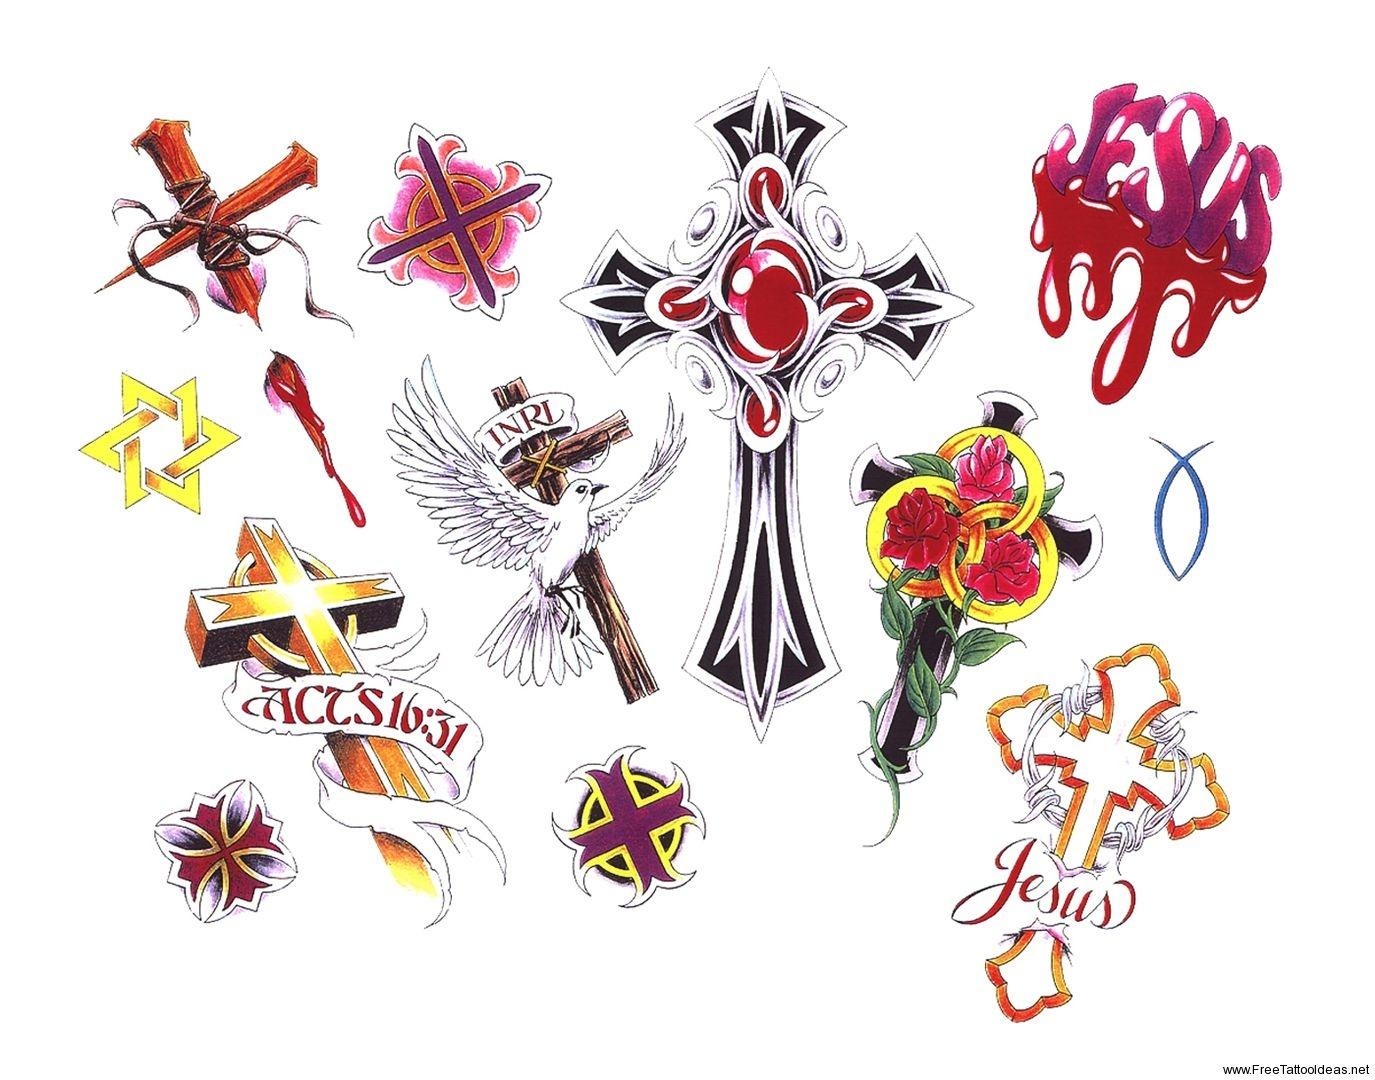 Free Printable Tattoo Flash   Cross Tattoos Designs - Free Cross - Free Printable Cross Tattoo Designs